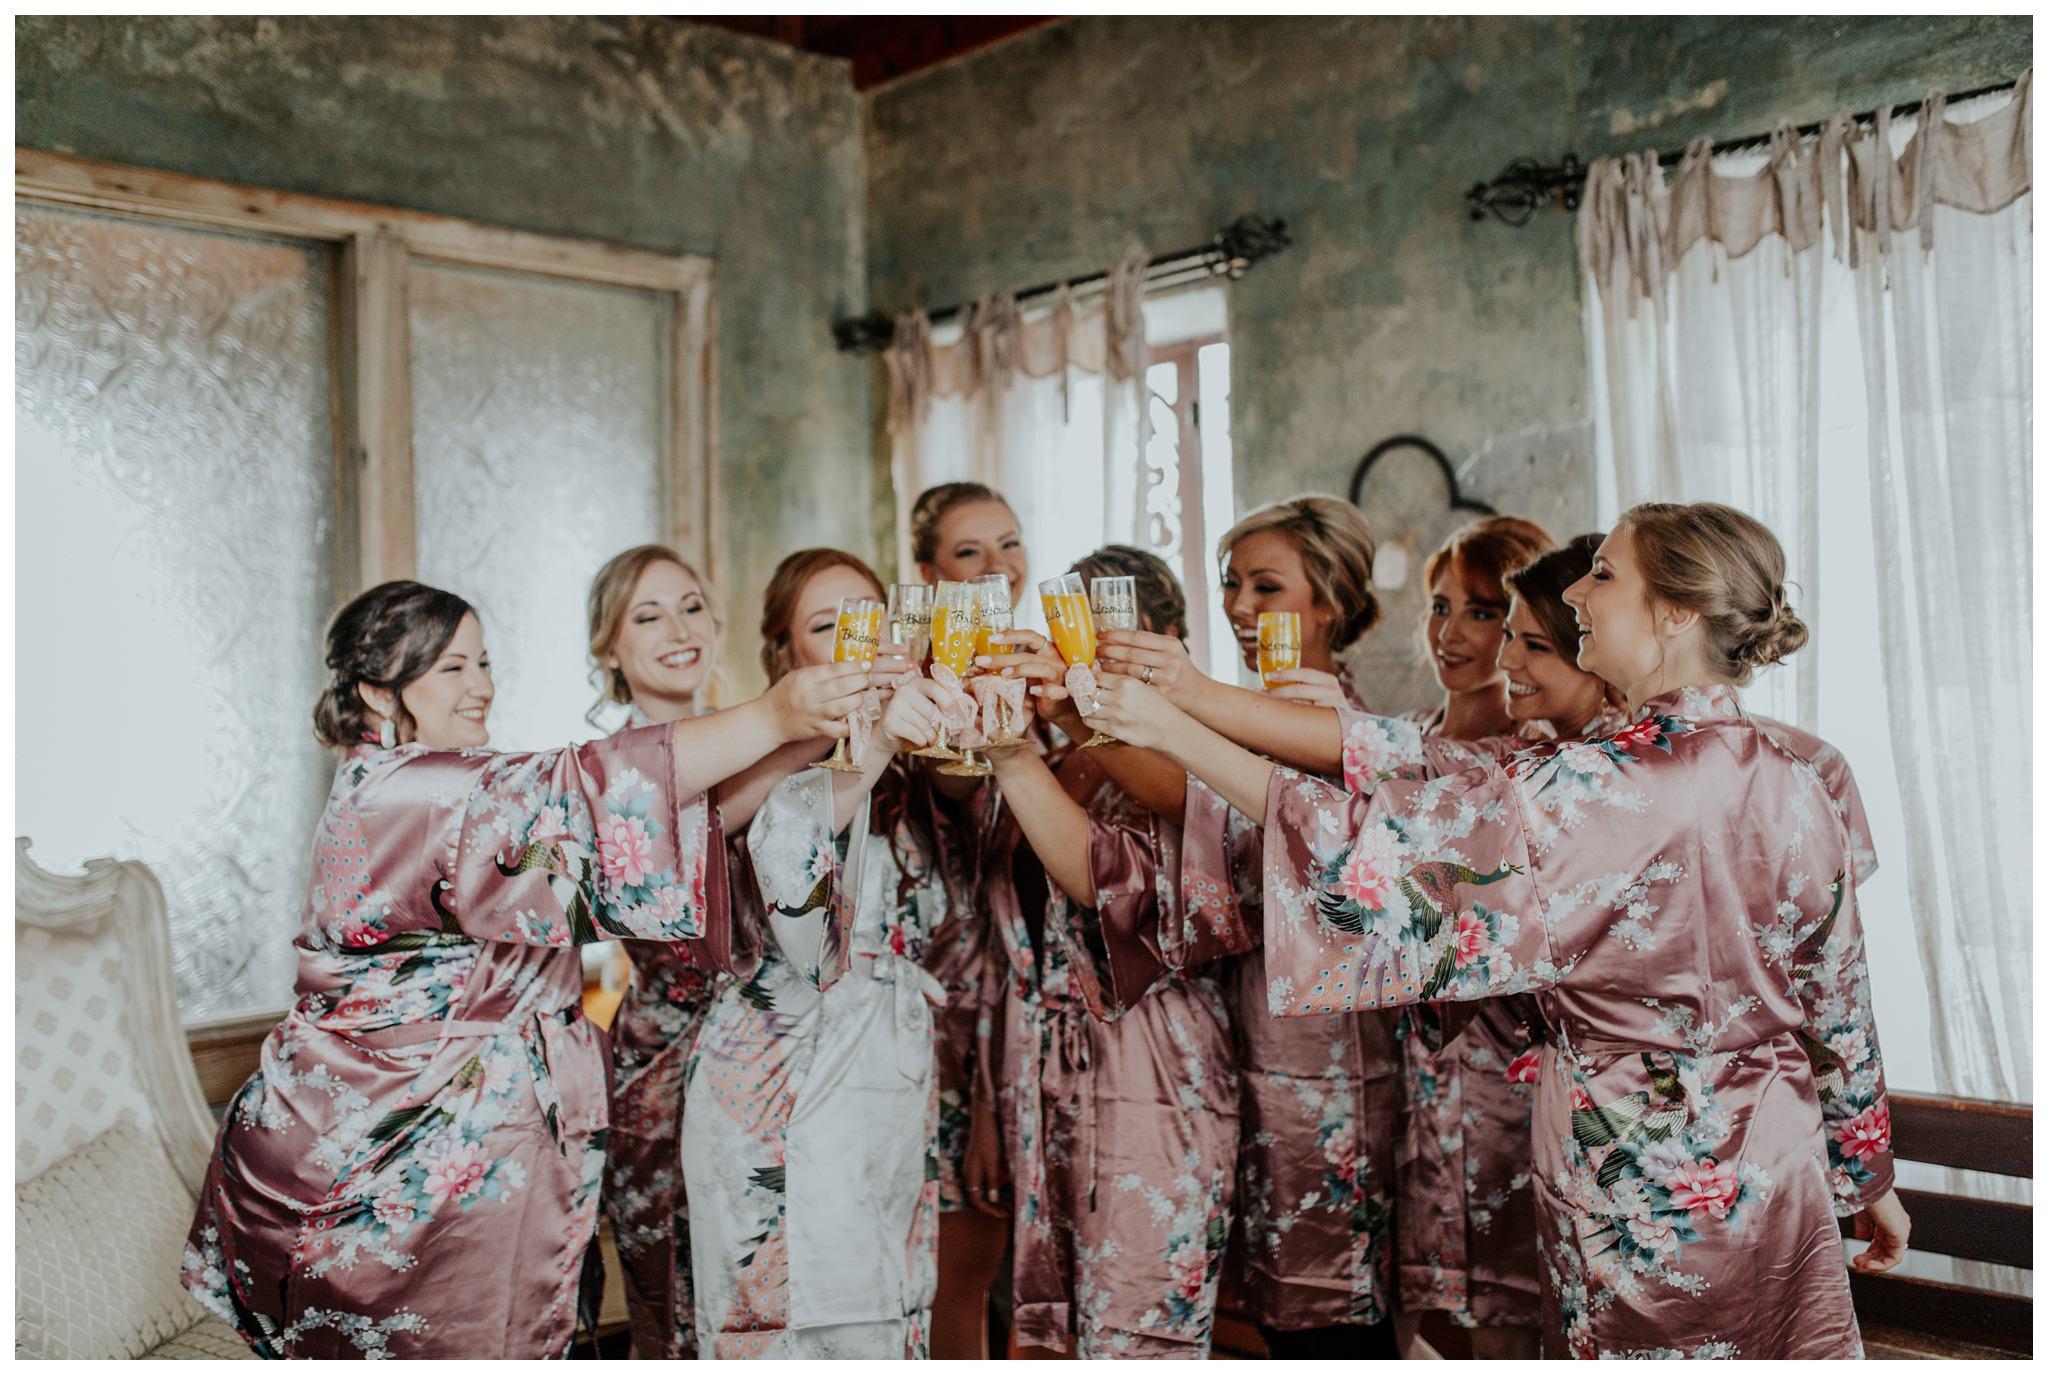 Summertime Olde Dobbin Station - Magnolia Wedding - The Woodlands Texas Wedding Photographer-2341.jpg